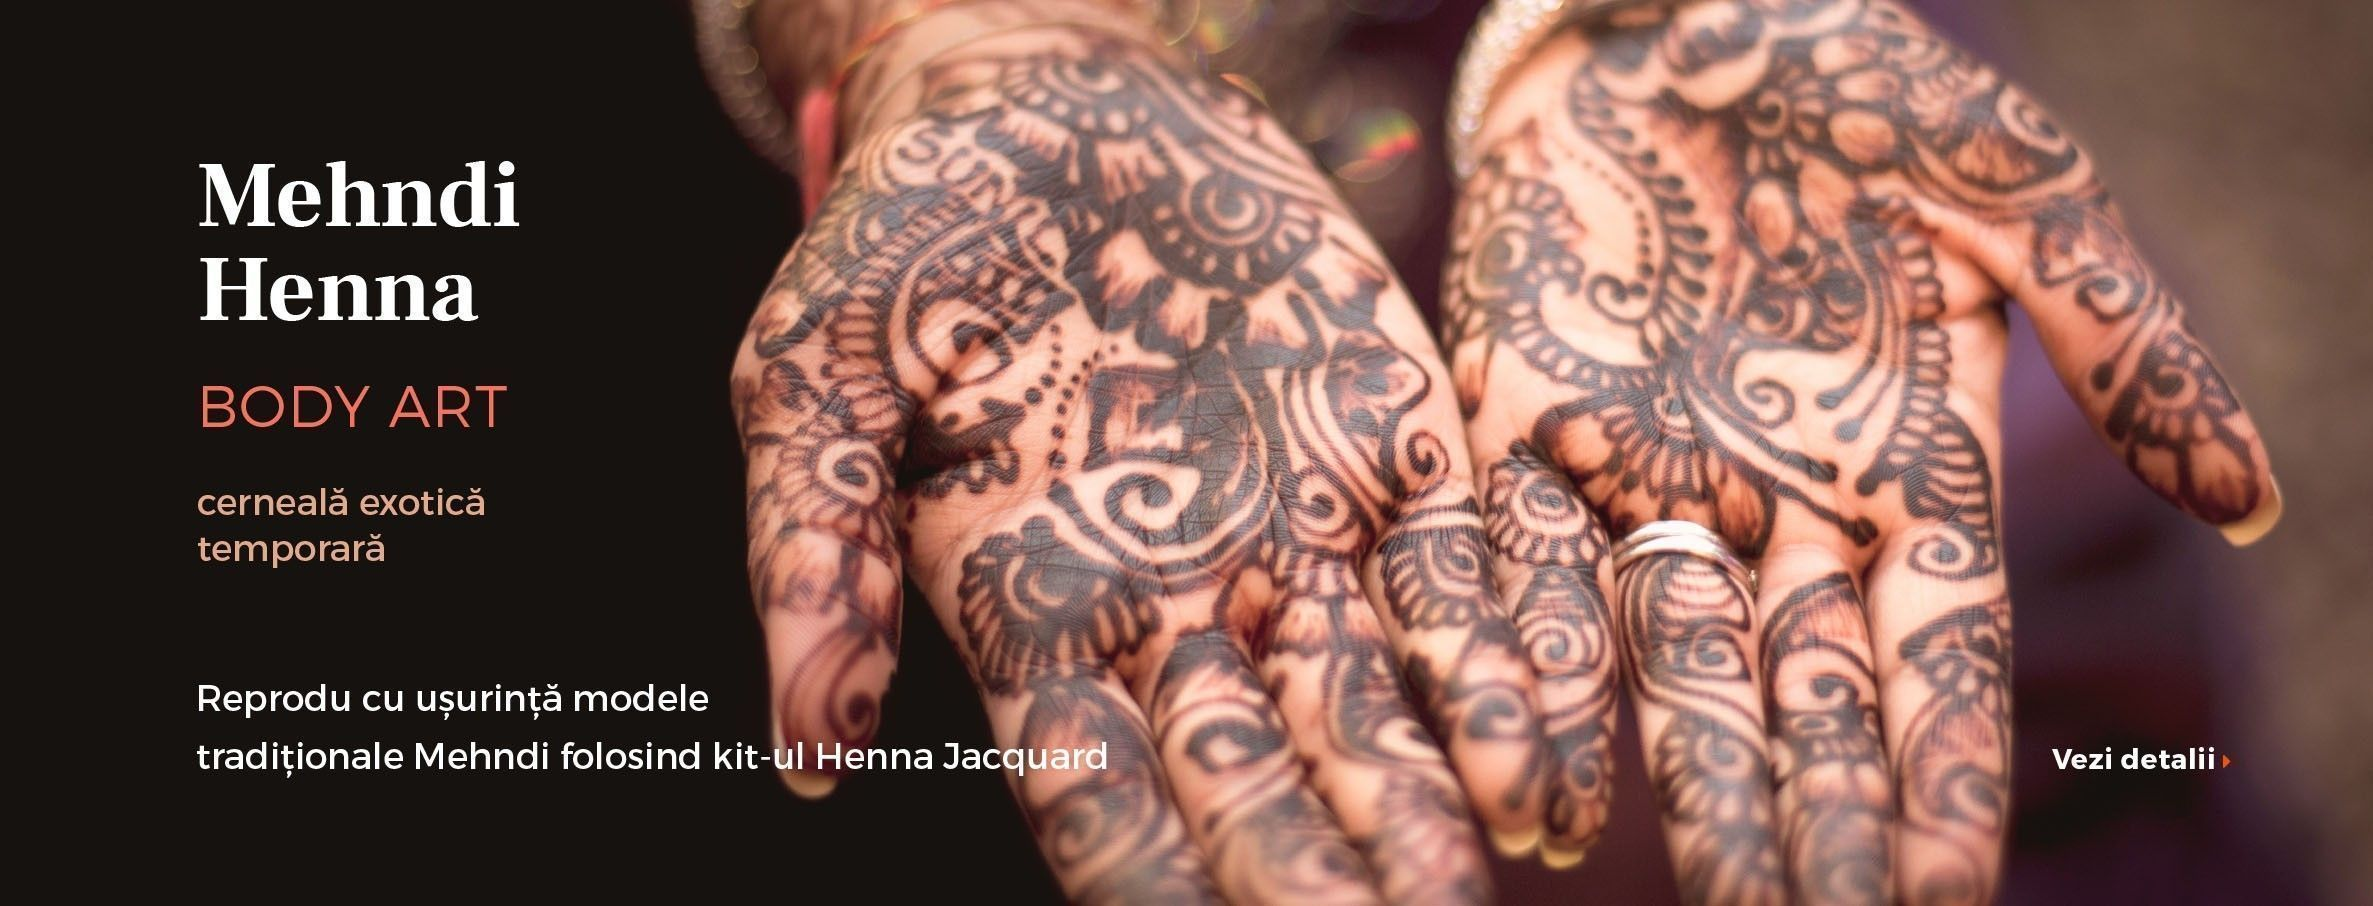 Tatuaje tempoarare cu Henna Jacquard Kit